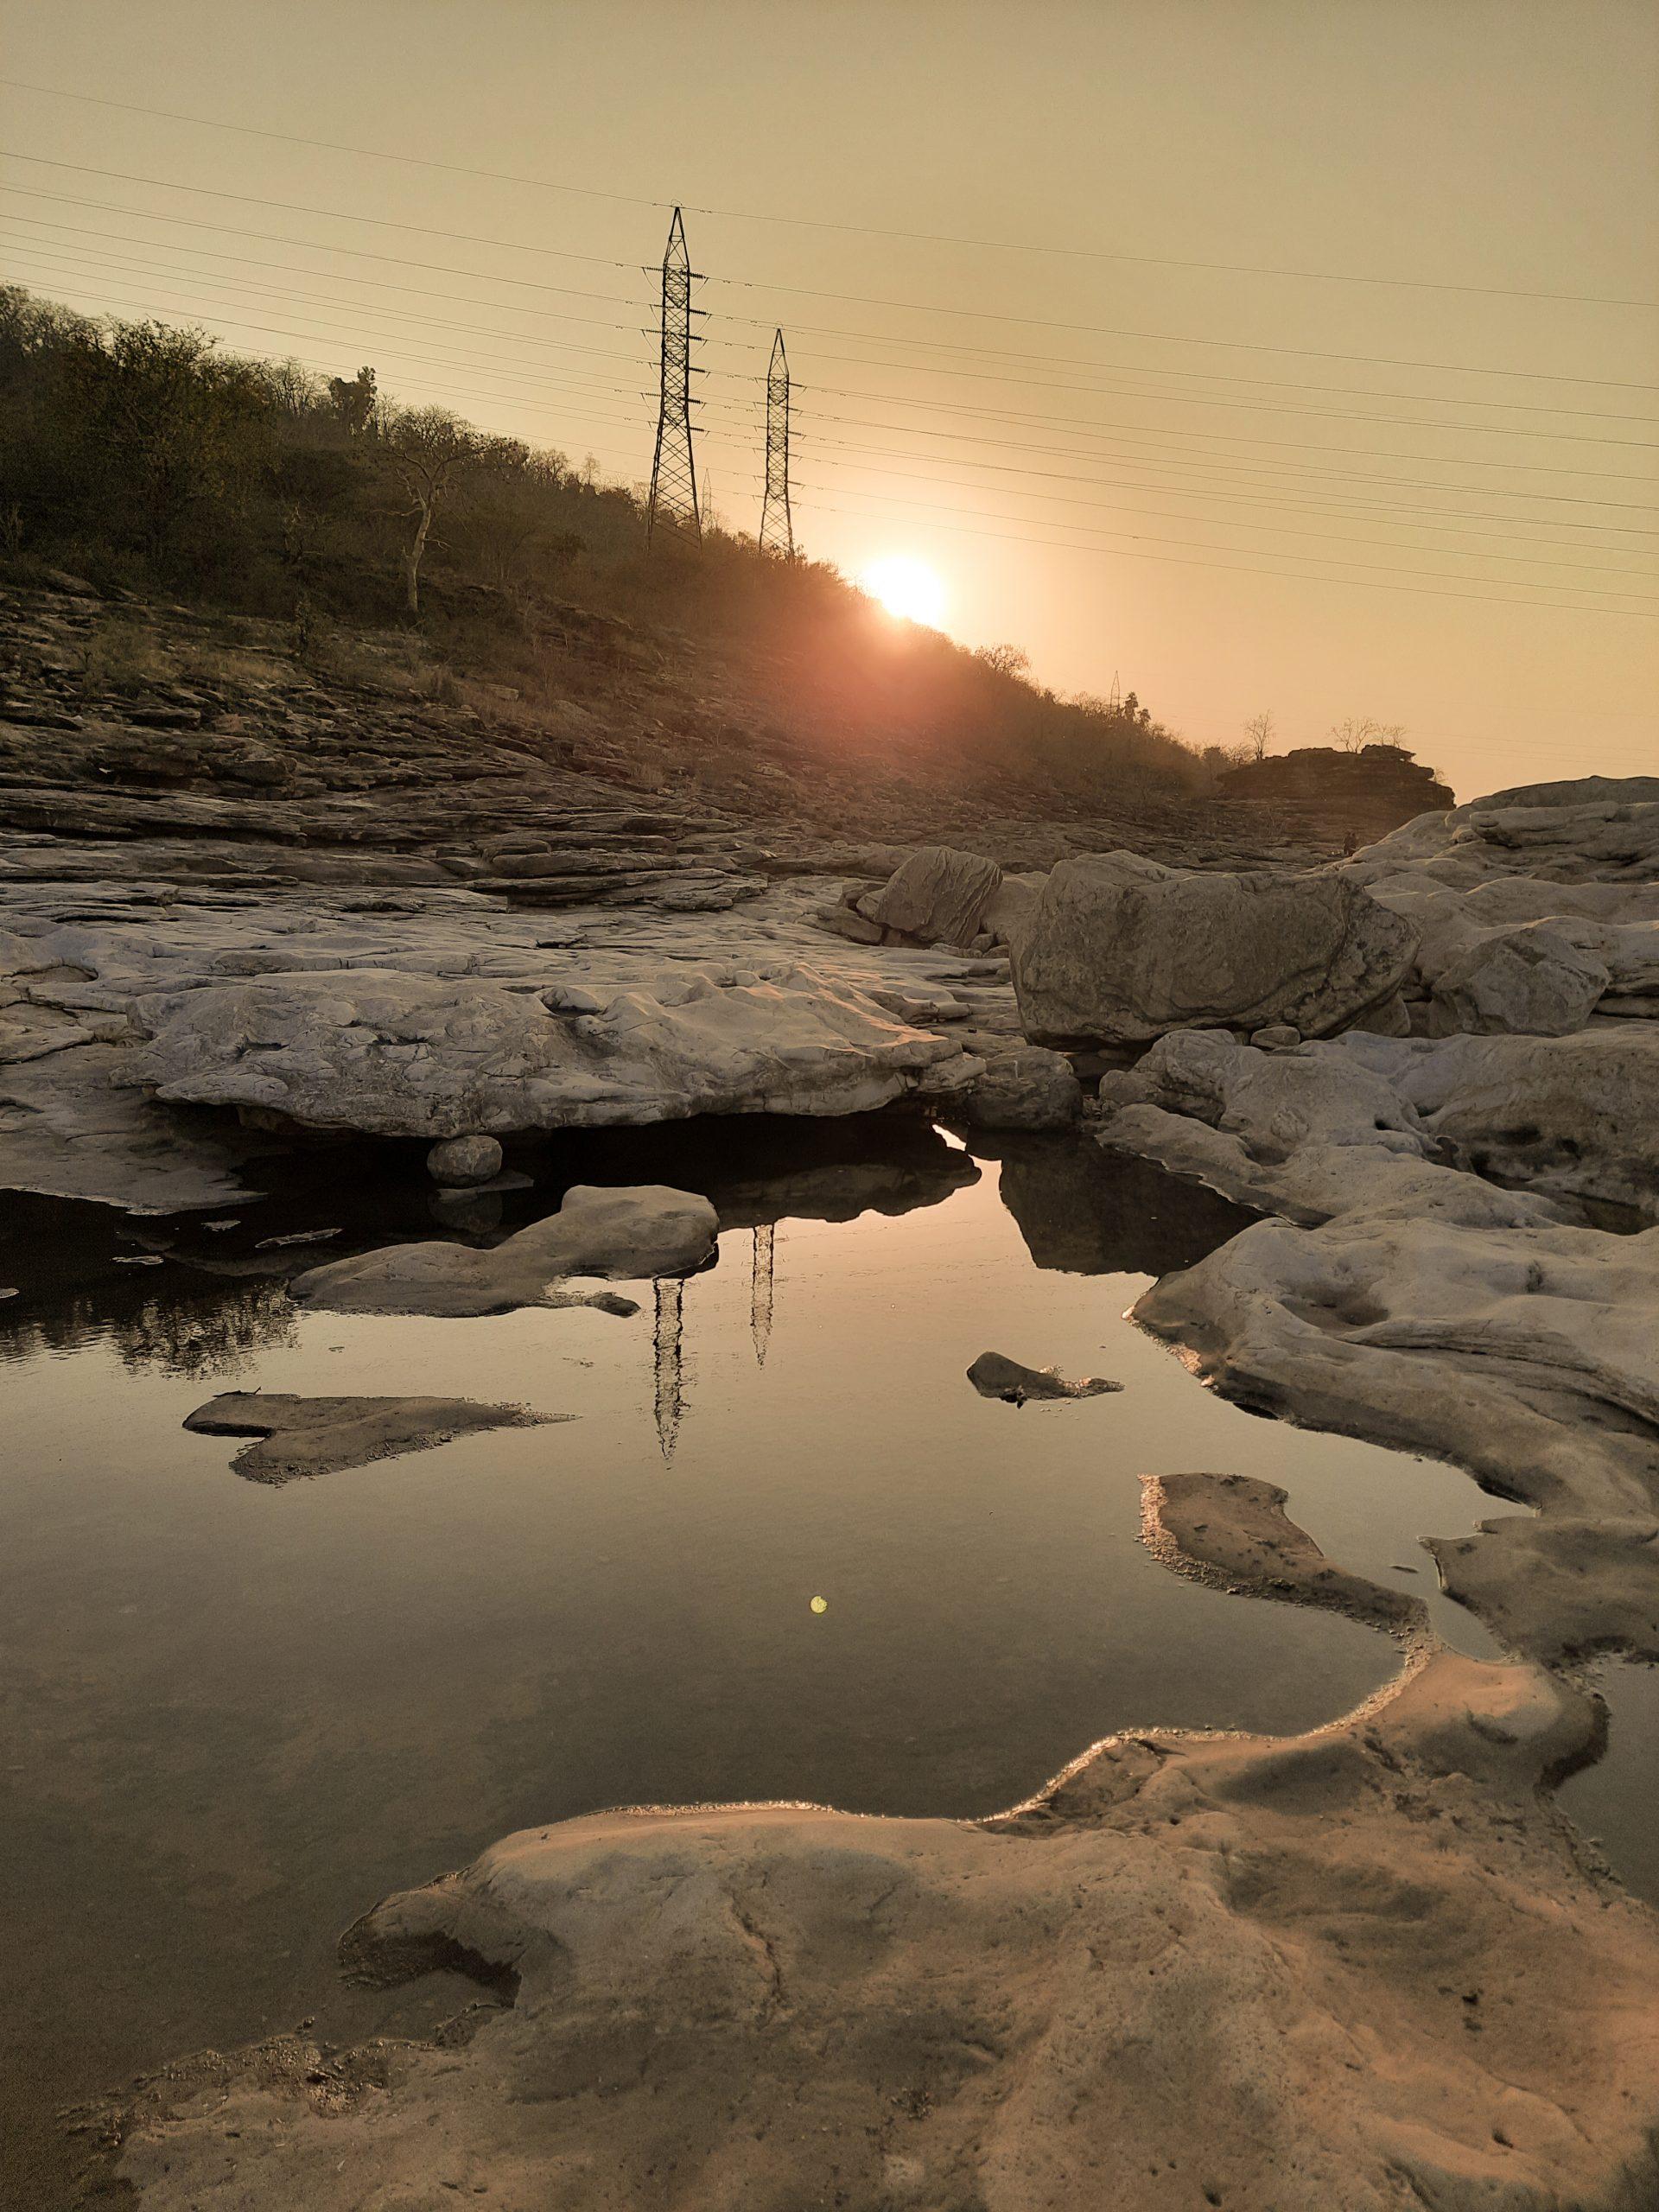 Accumulated water around rocks